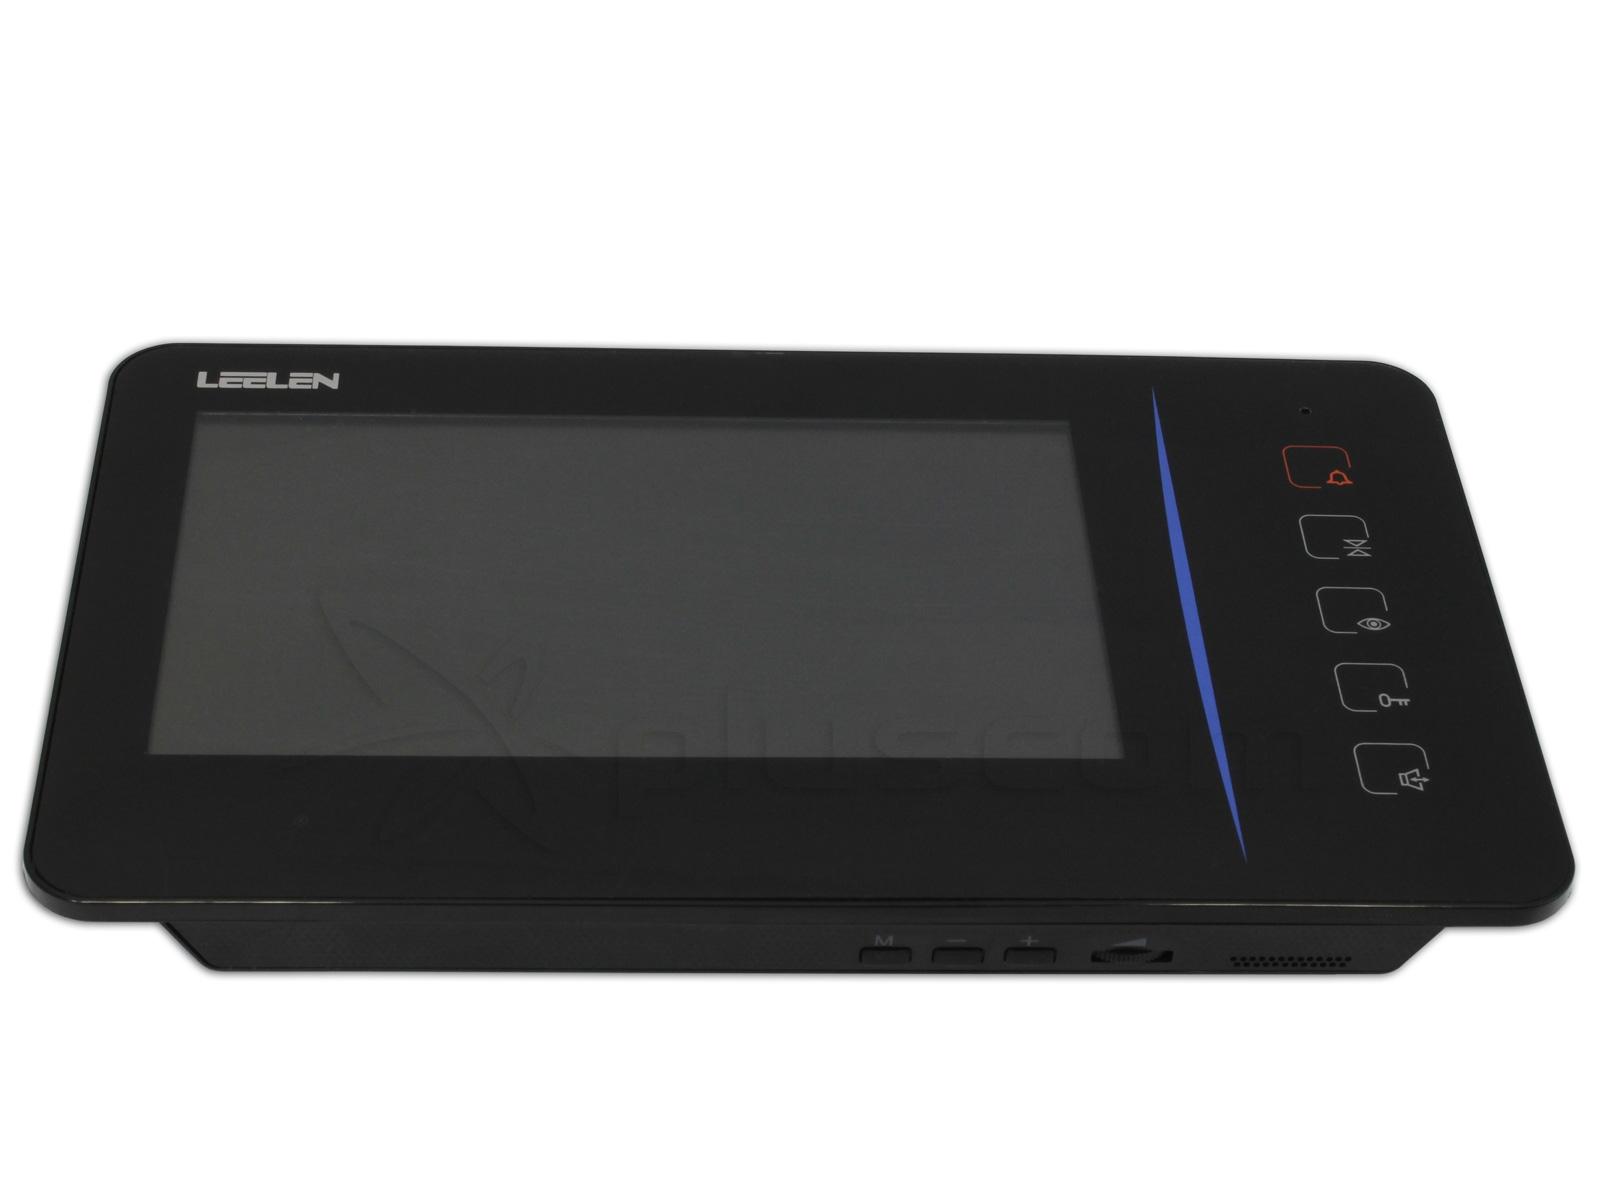 leelen video intercom jb304 n60 rh pluscom pl Nutone Intercom Wiring-Diagram Loop Checking for Electrical Intercom